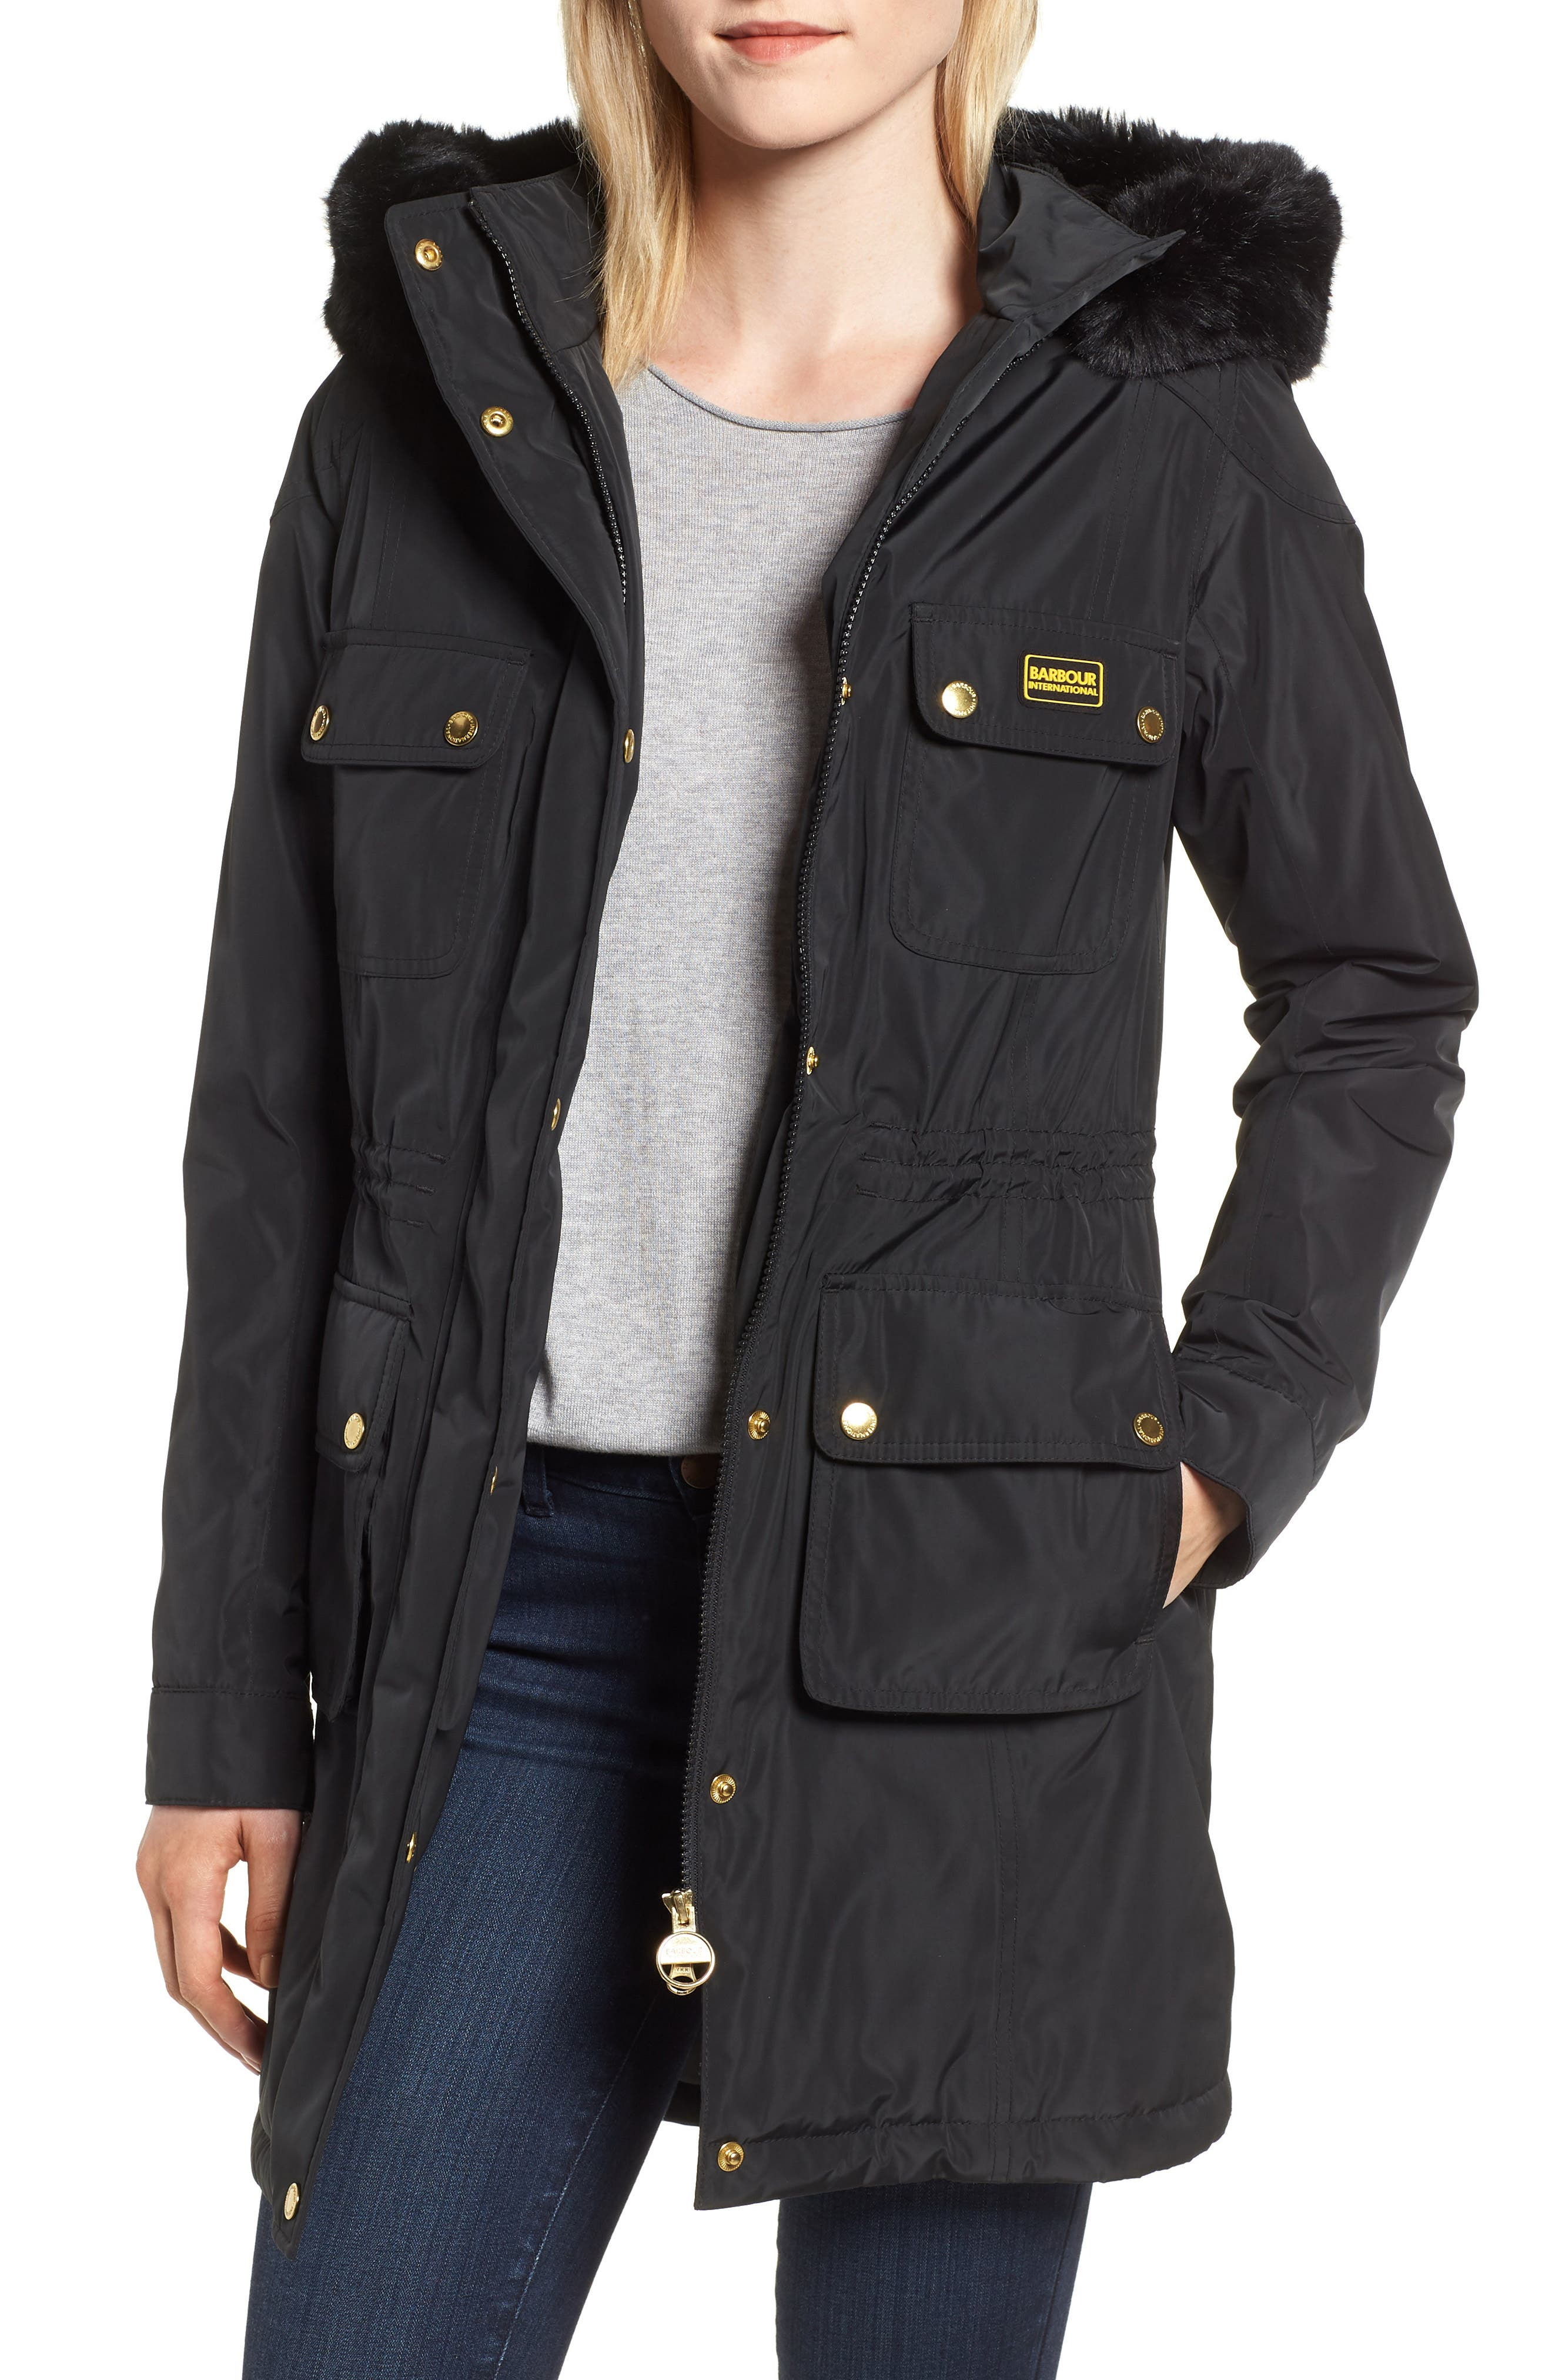 Barbour Imatra Waterproof Jacket With Faux Fur Trim, US / 12 UK - Black